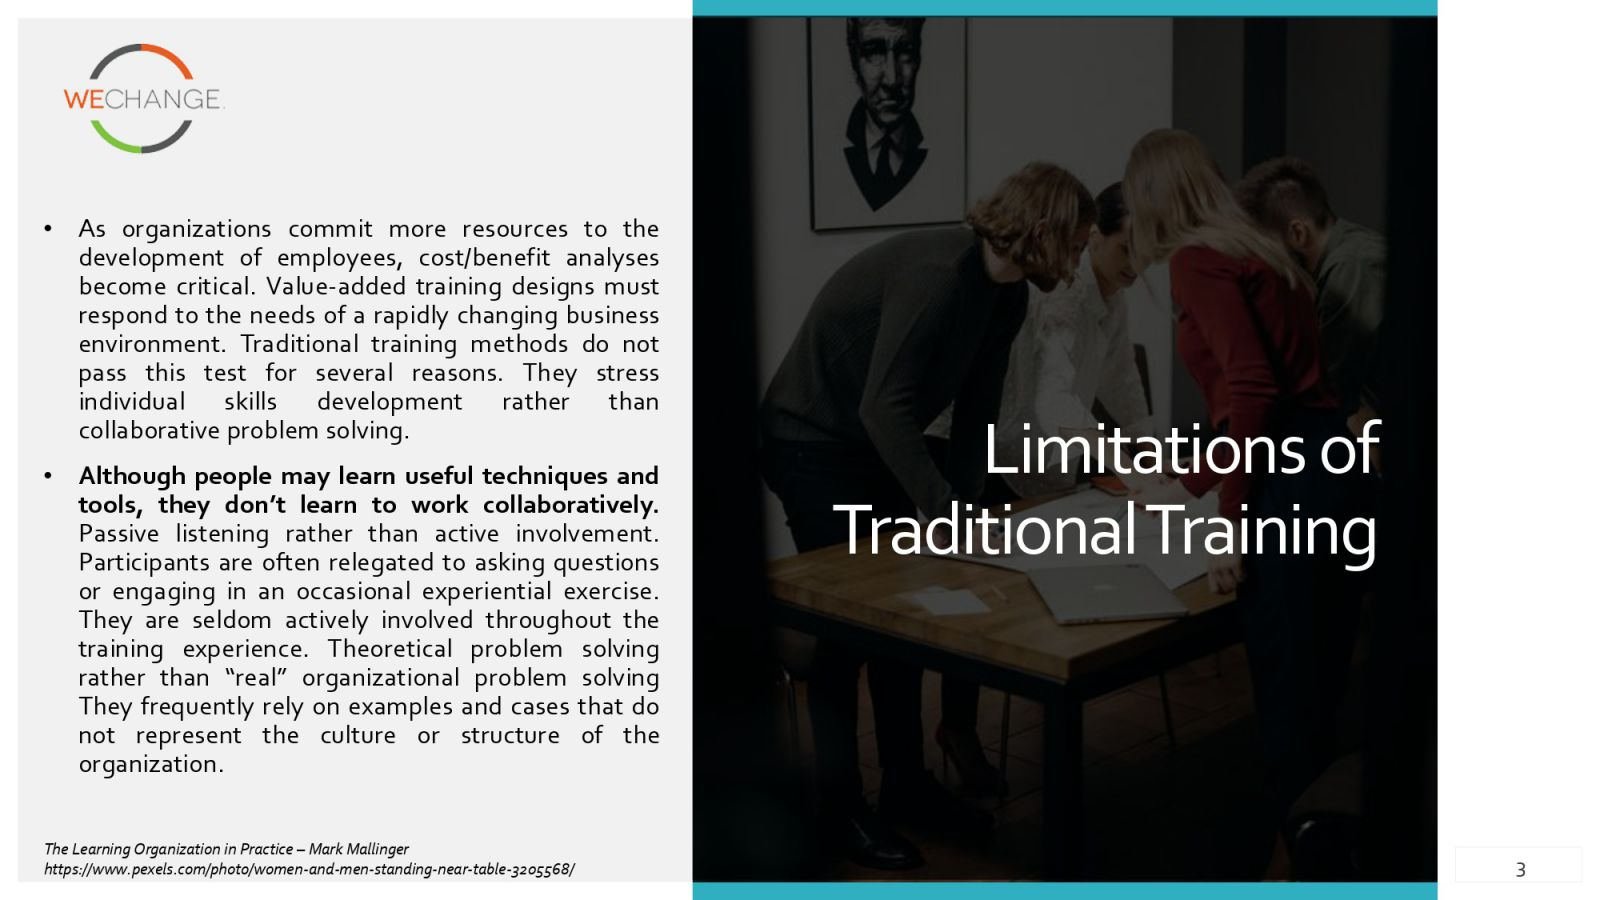 learnin organization in practice page 0003 compressed The learning organization in practice